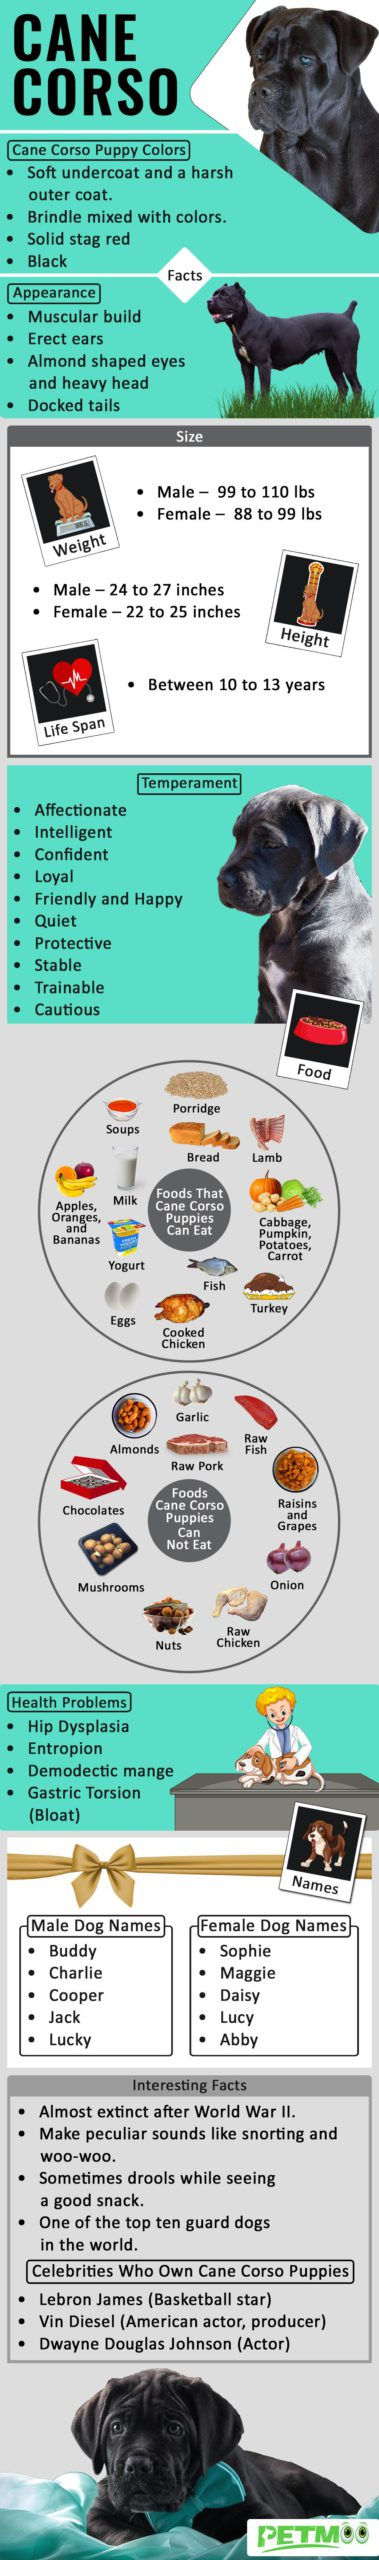 Cane Corso Infographic